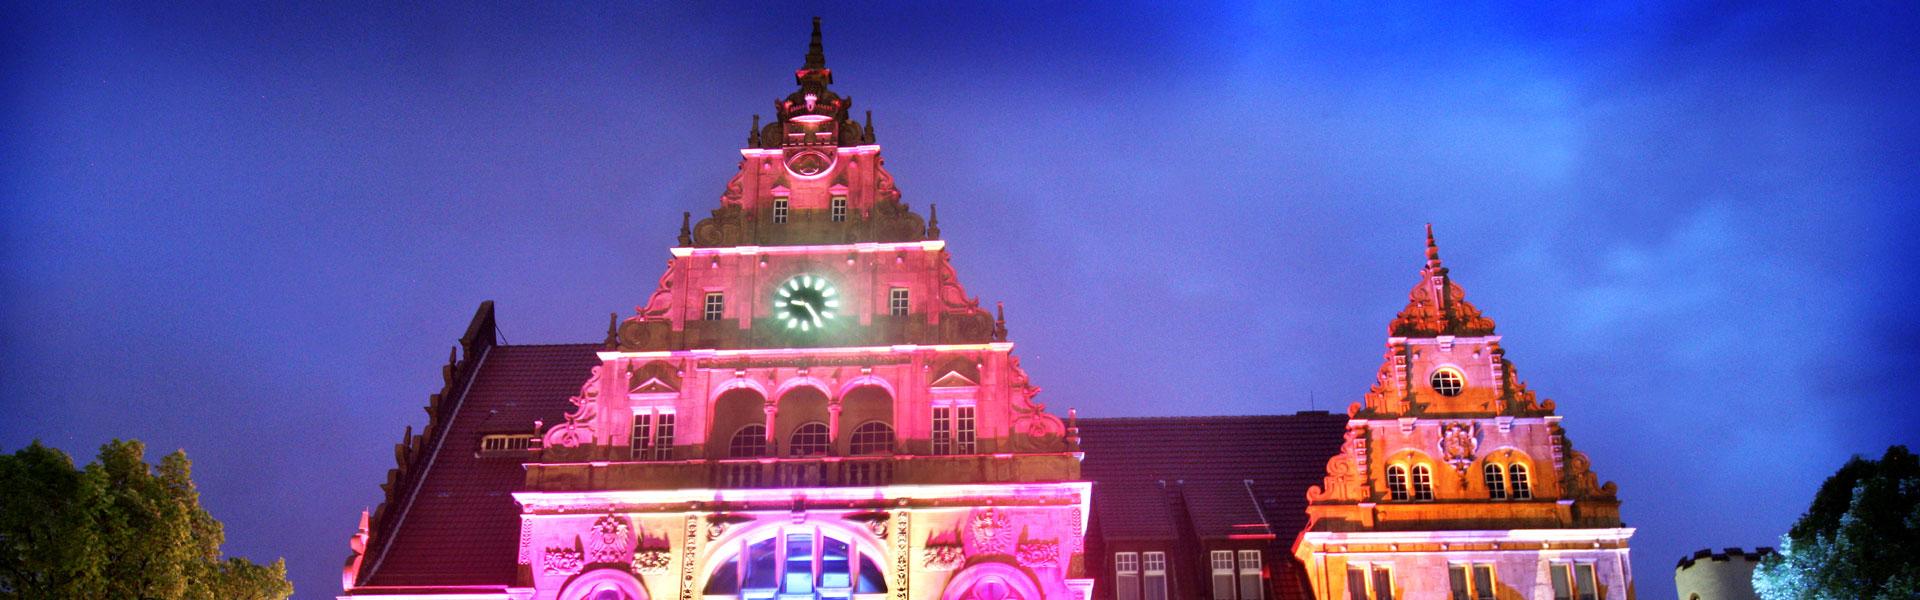 Bielefeld Rathaus